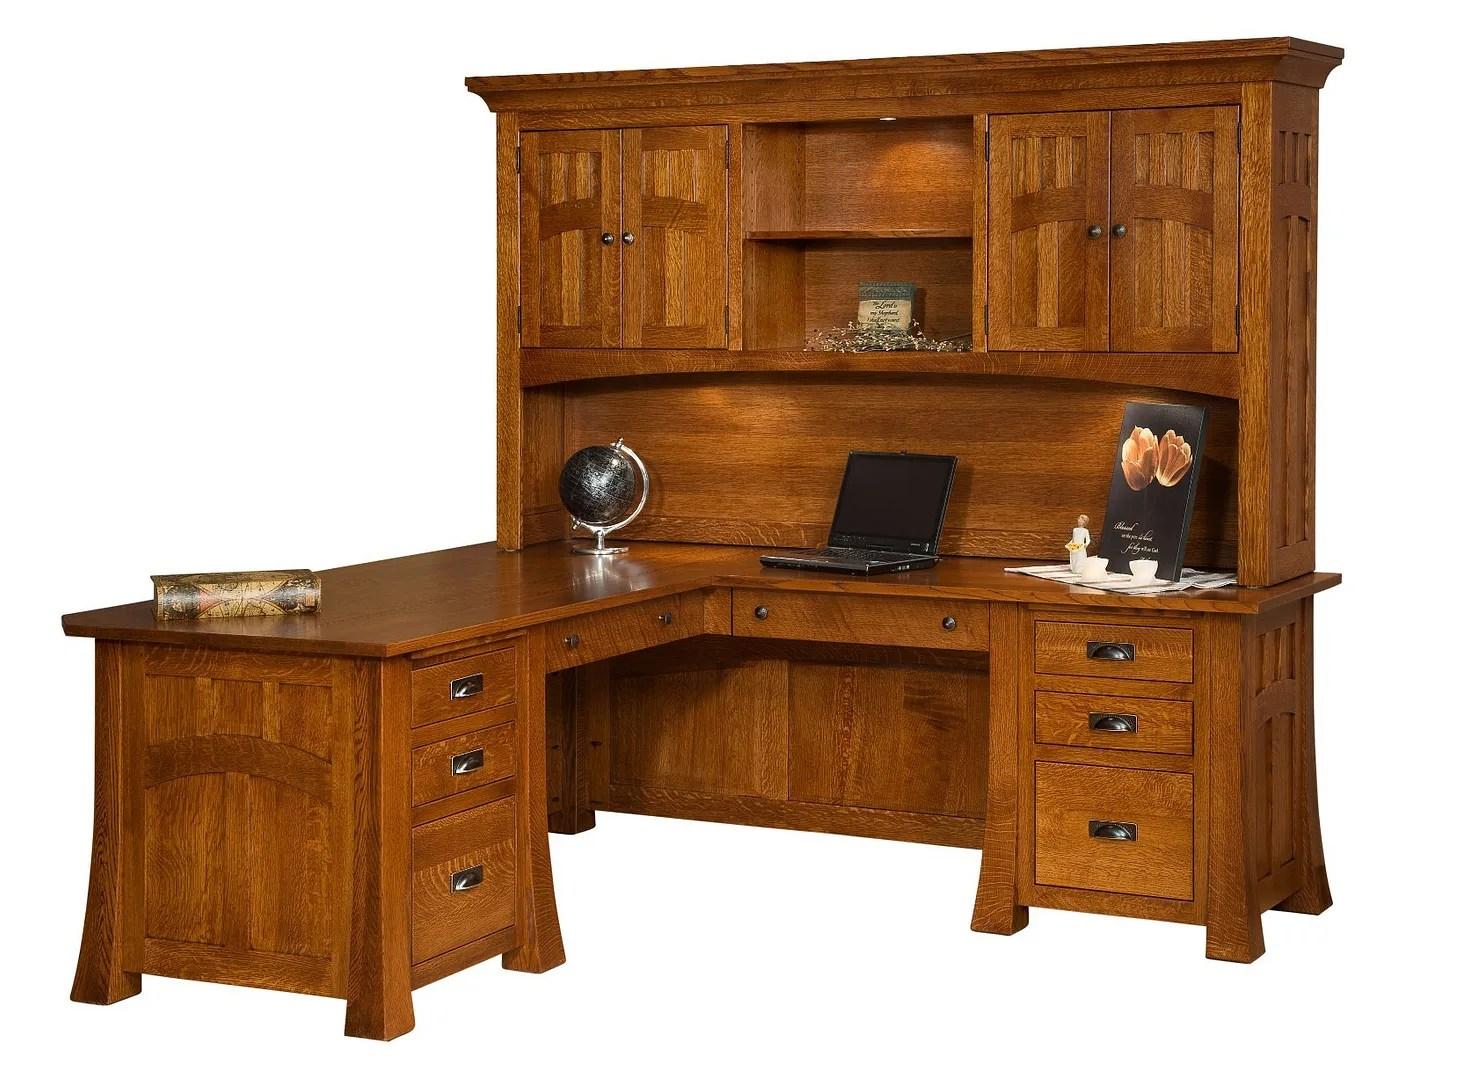 Amish Mission Arts & Crafts Corner Computer Desk Hutch